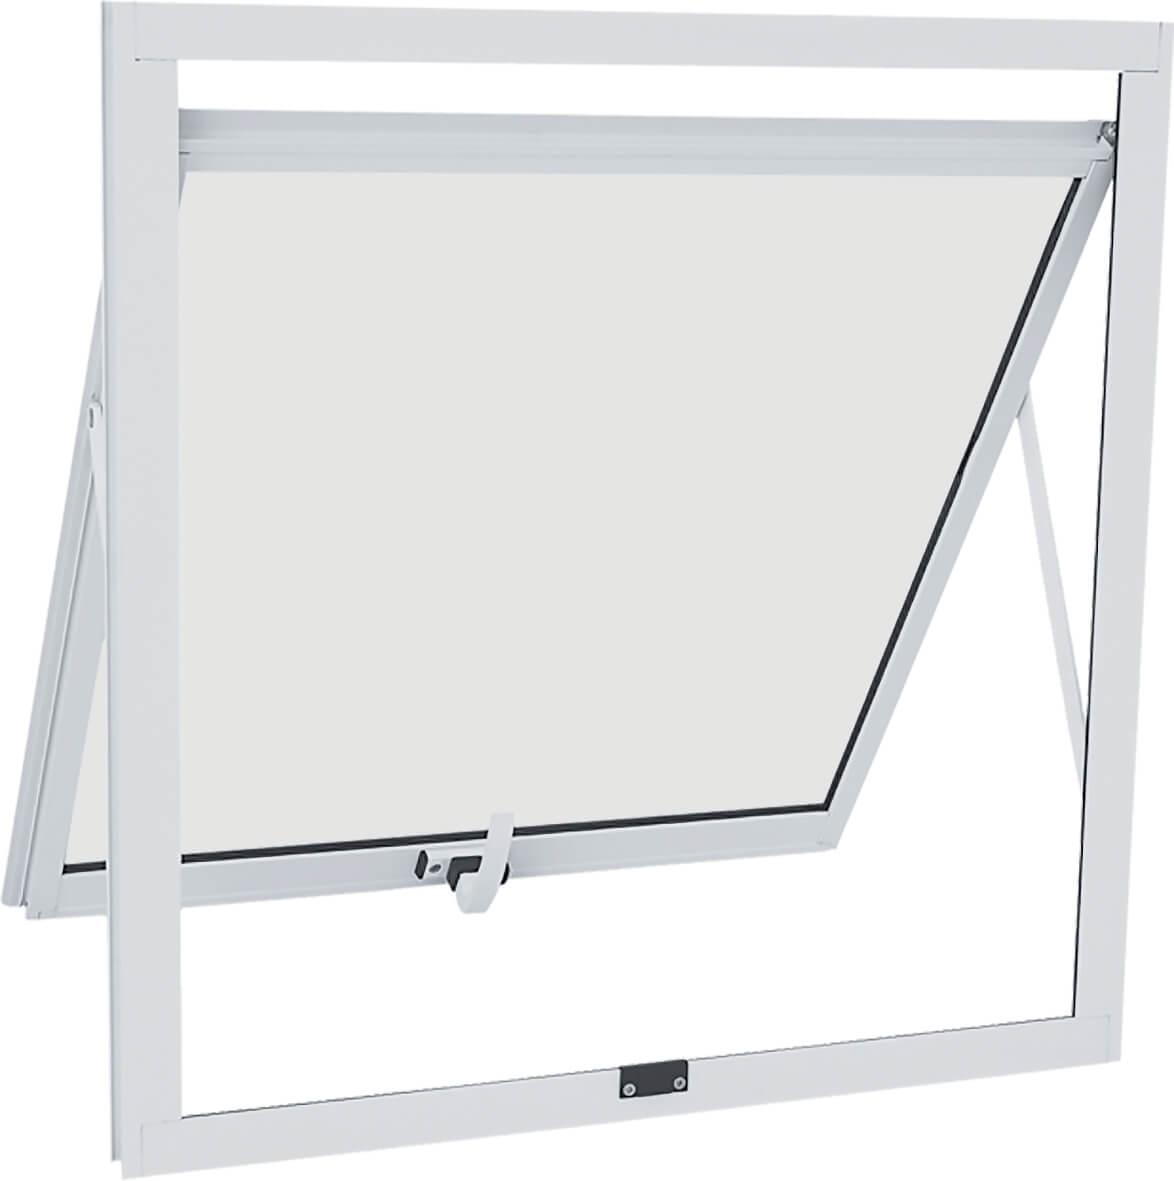 Alumifit Janela Maxim-Ar - 0.60x0.60x0.03 Ref. 78.20.101-0 Sasazaki